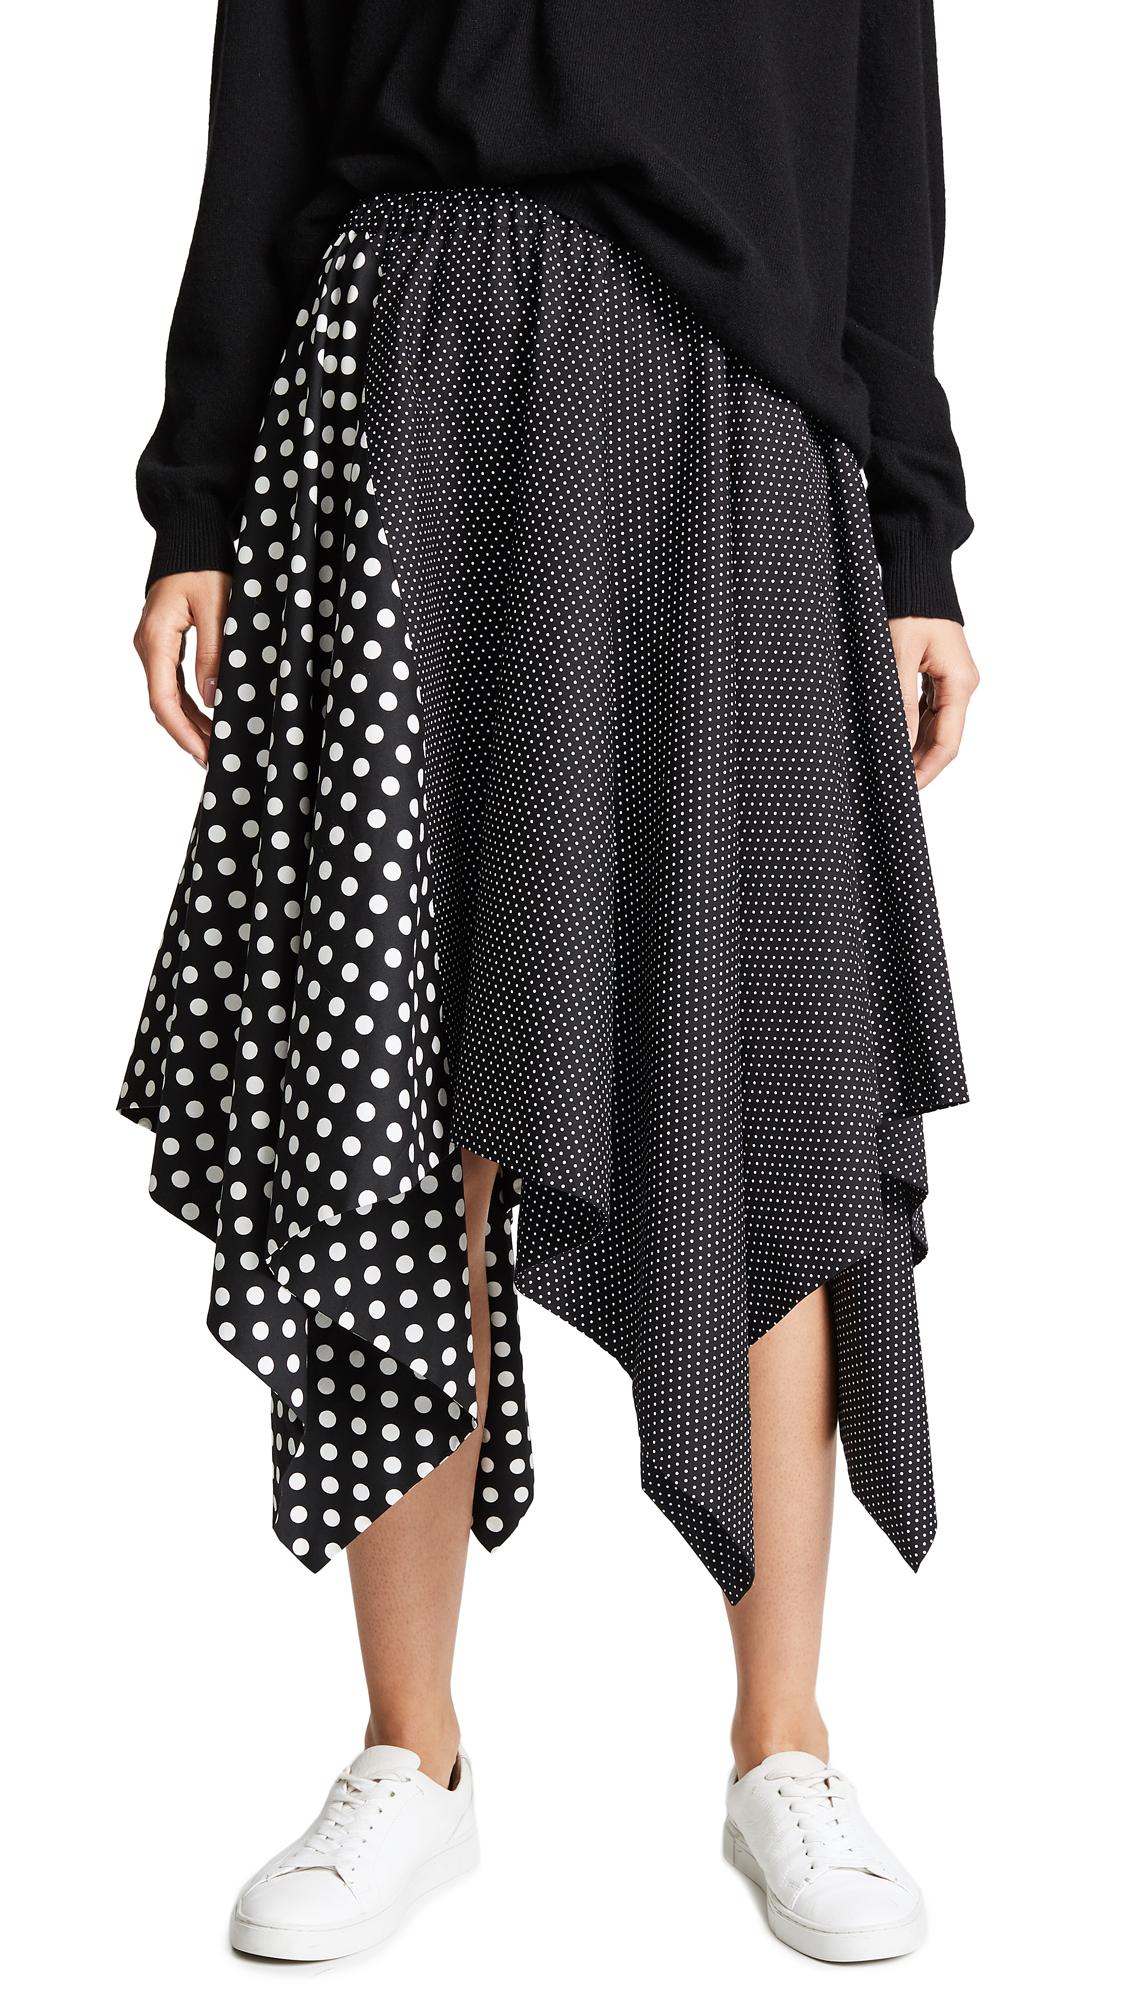 Paskal Elastic Waistband Flared Skirt In Mixed Polka Dots